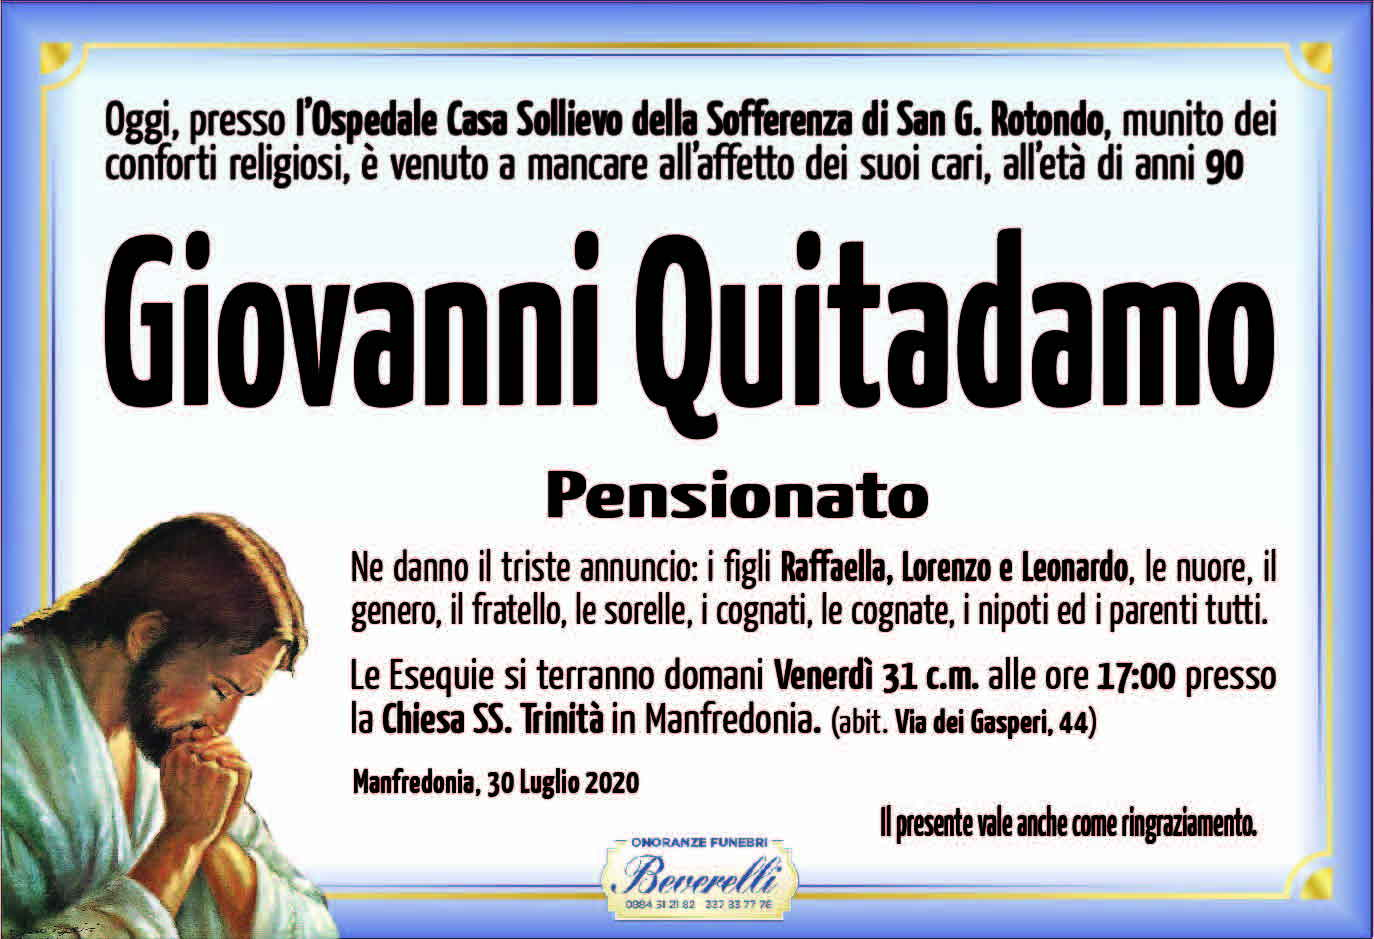 Giovanni Quitadamo